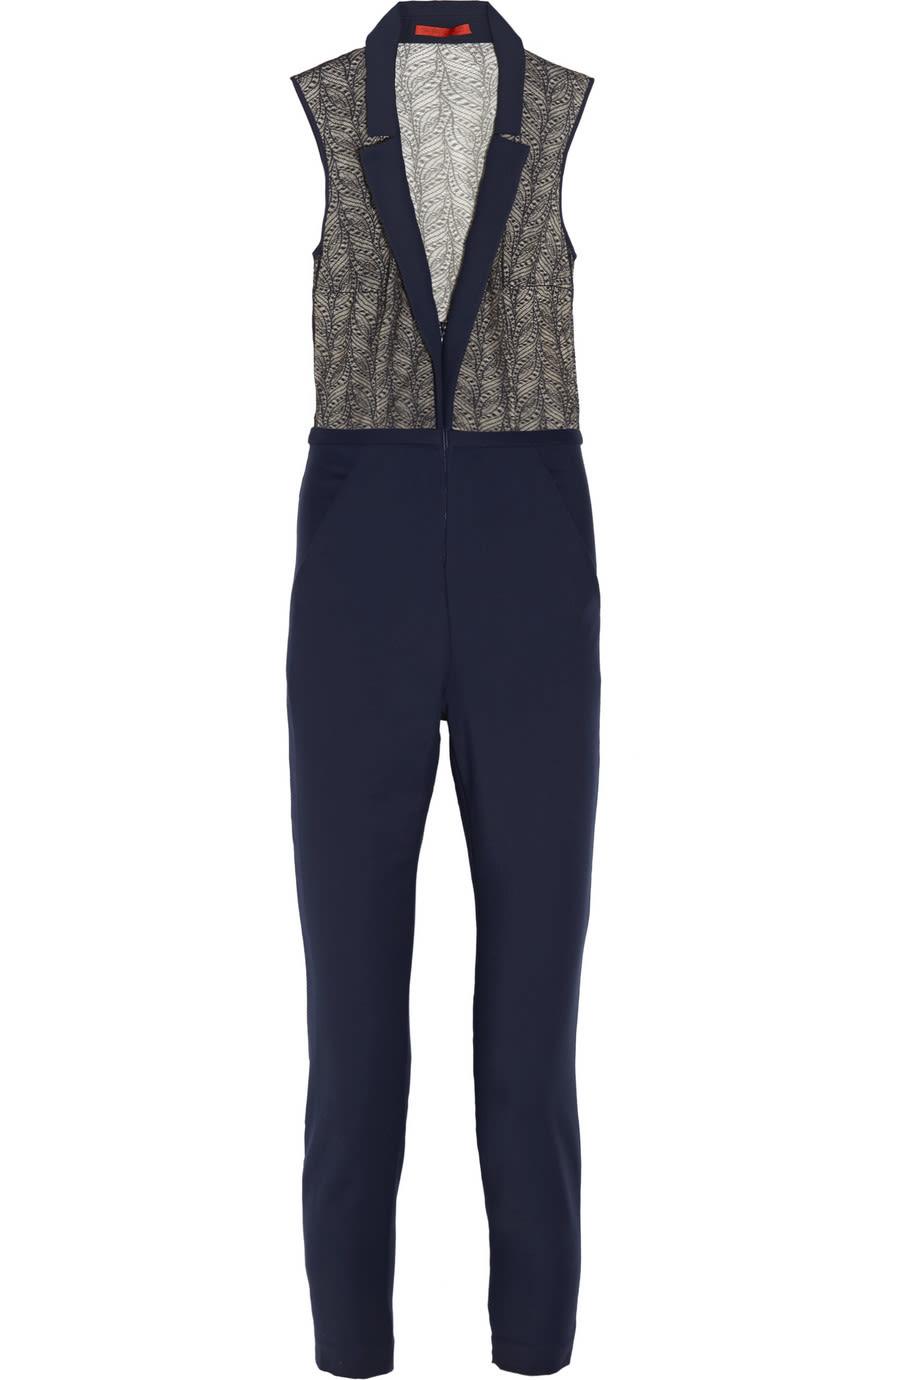 9c9eaa369f2b Tamara Mellon Lace and Stretch Cotton-Blend Jumpsuit